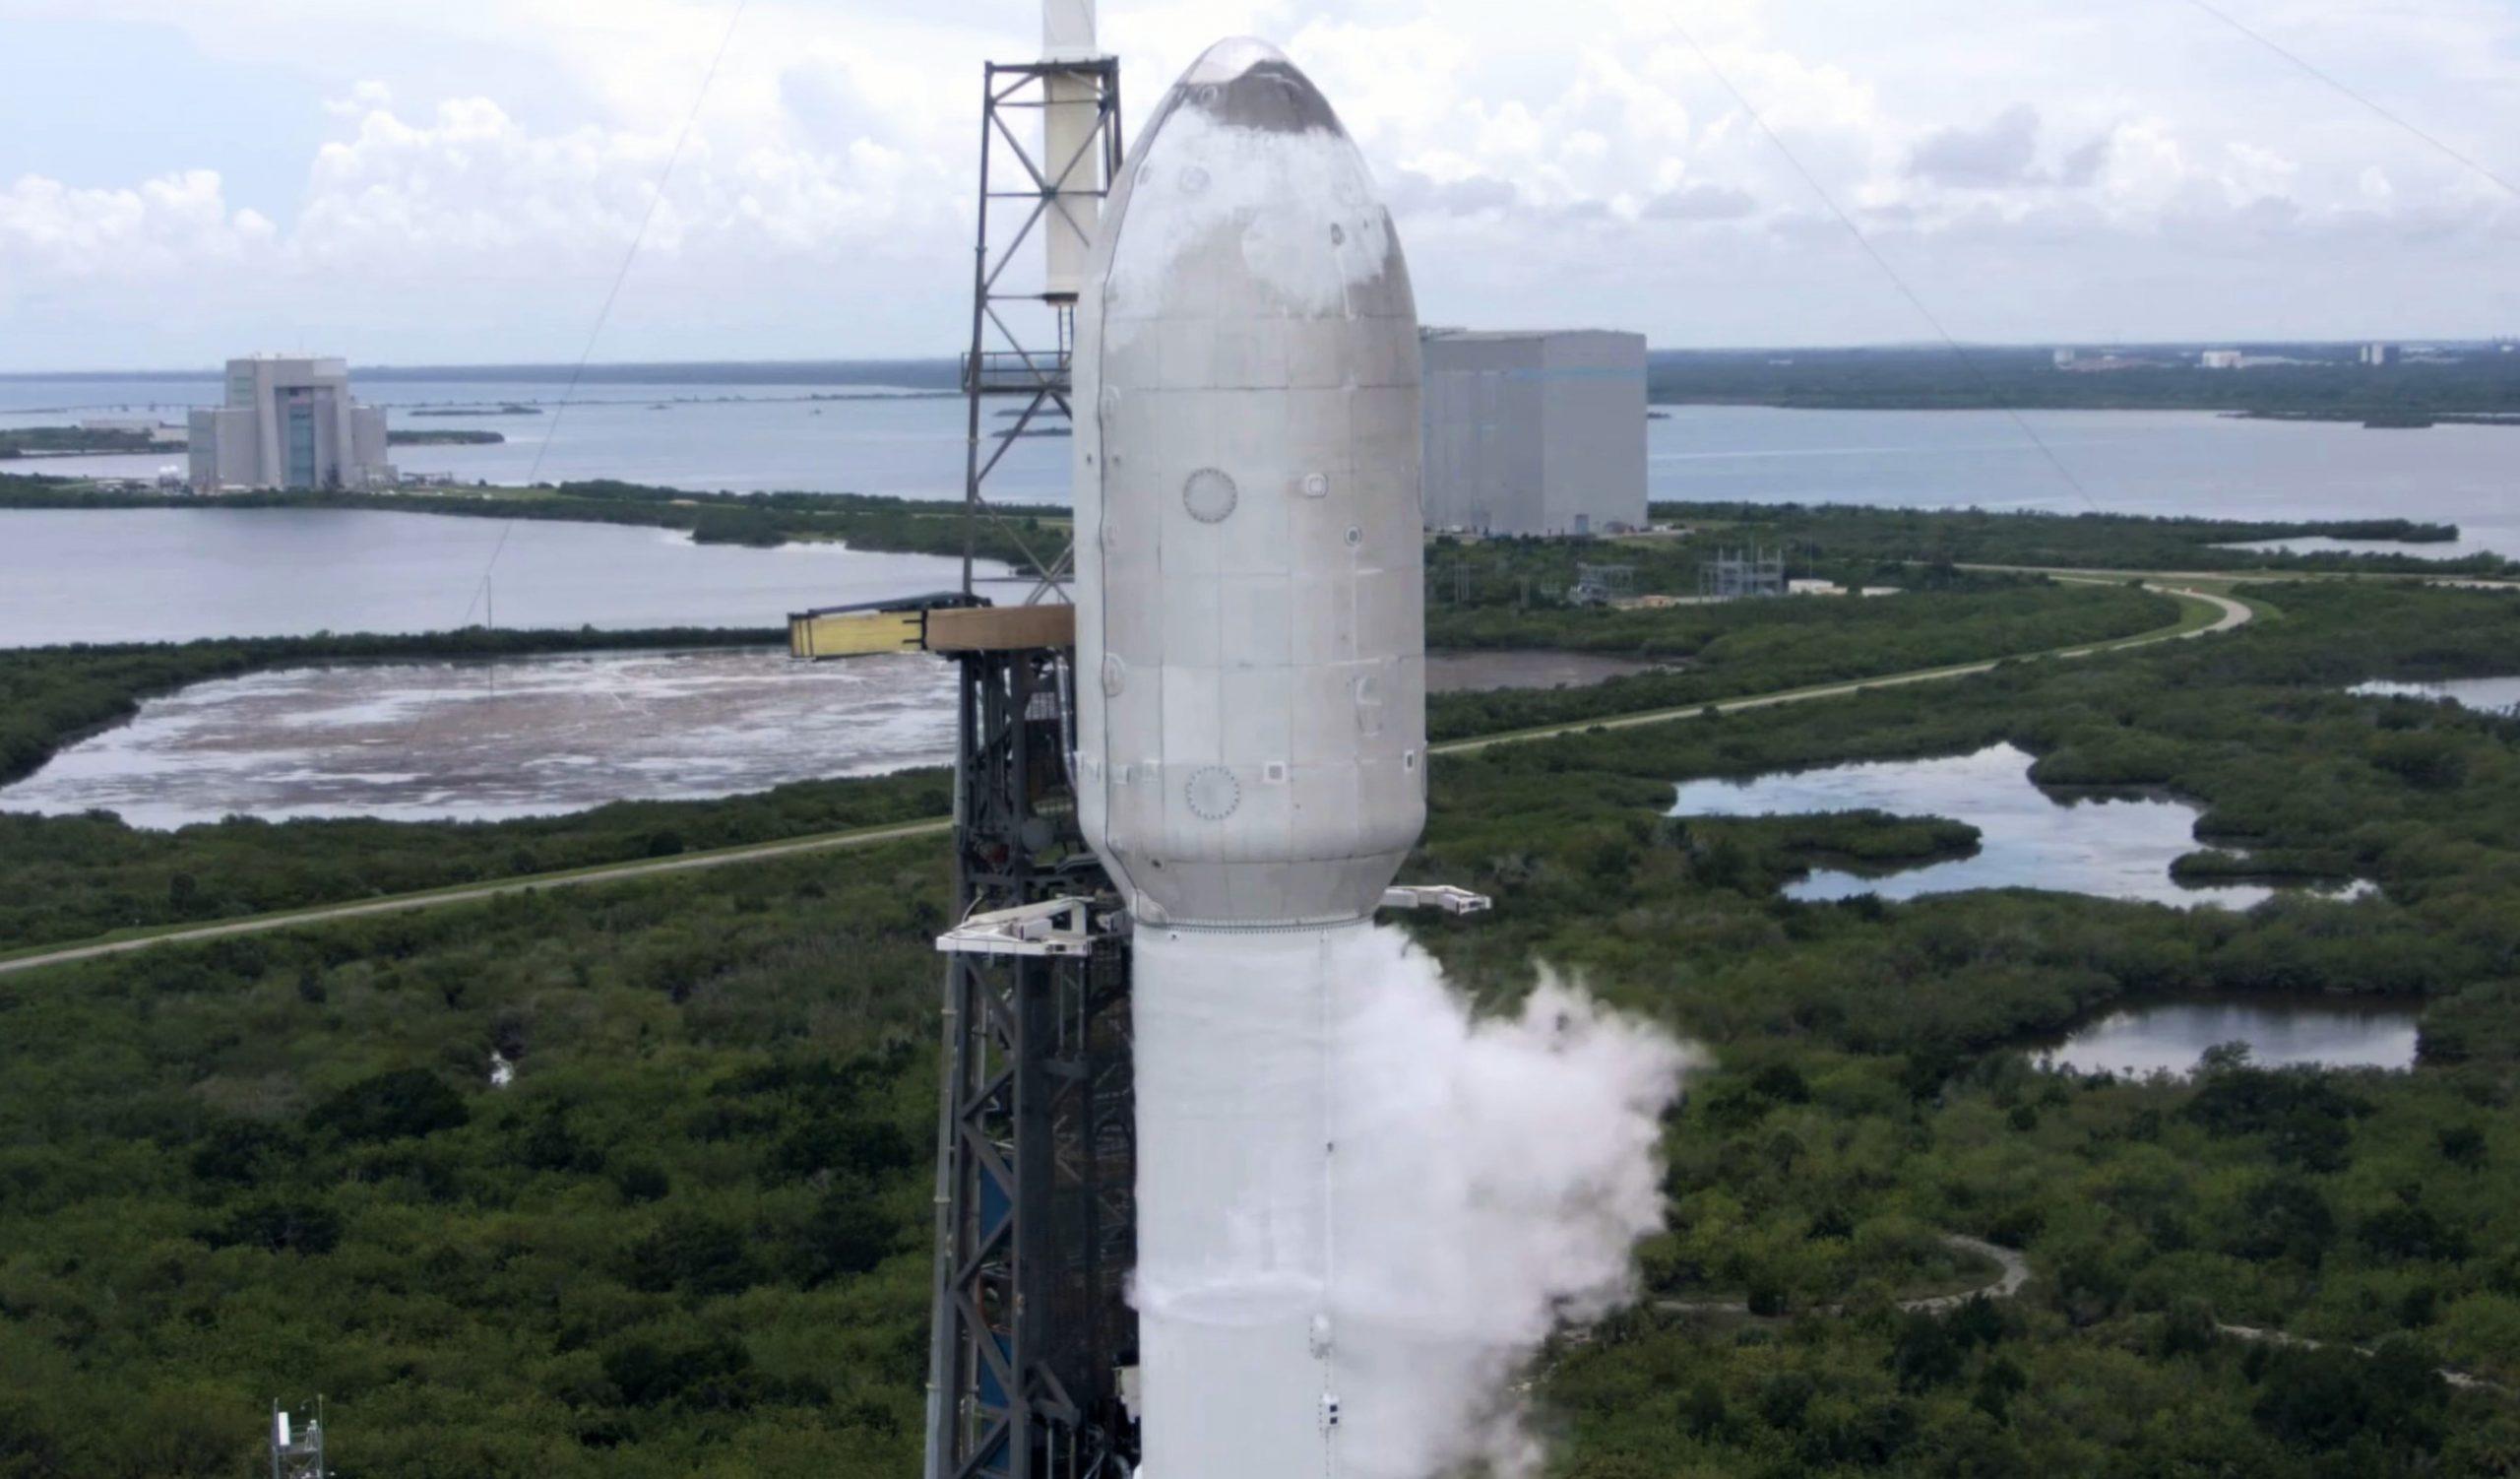 Transporter-2 Falcon 9 B1060 062921 webcast (SpaceX) fairing 2 crop